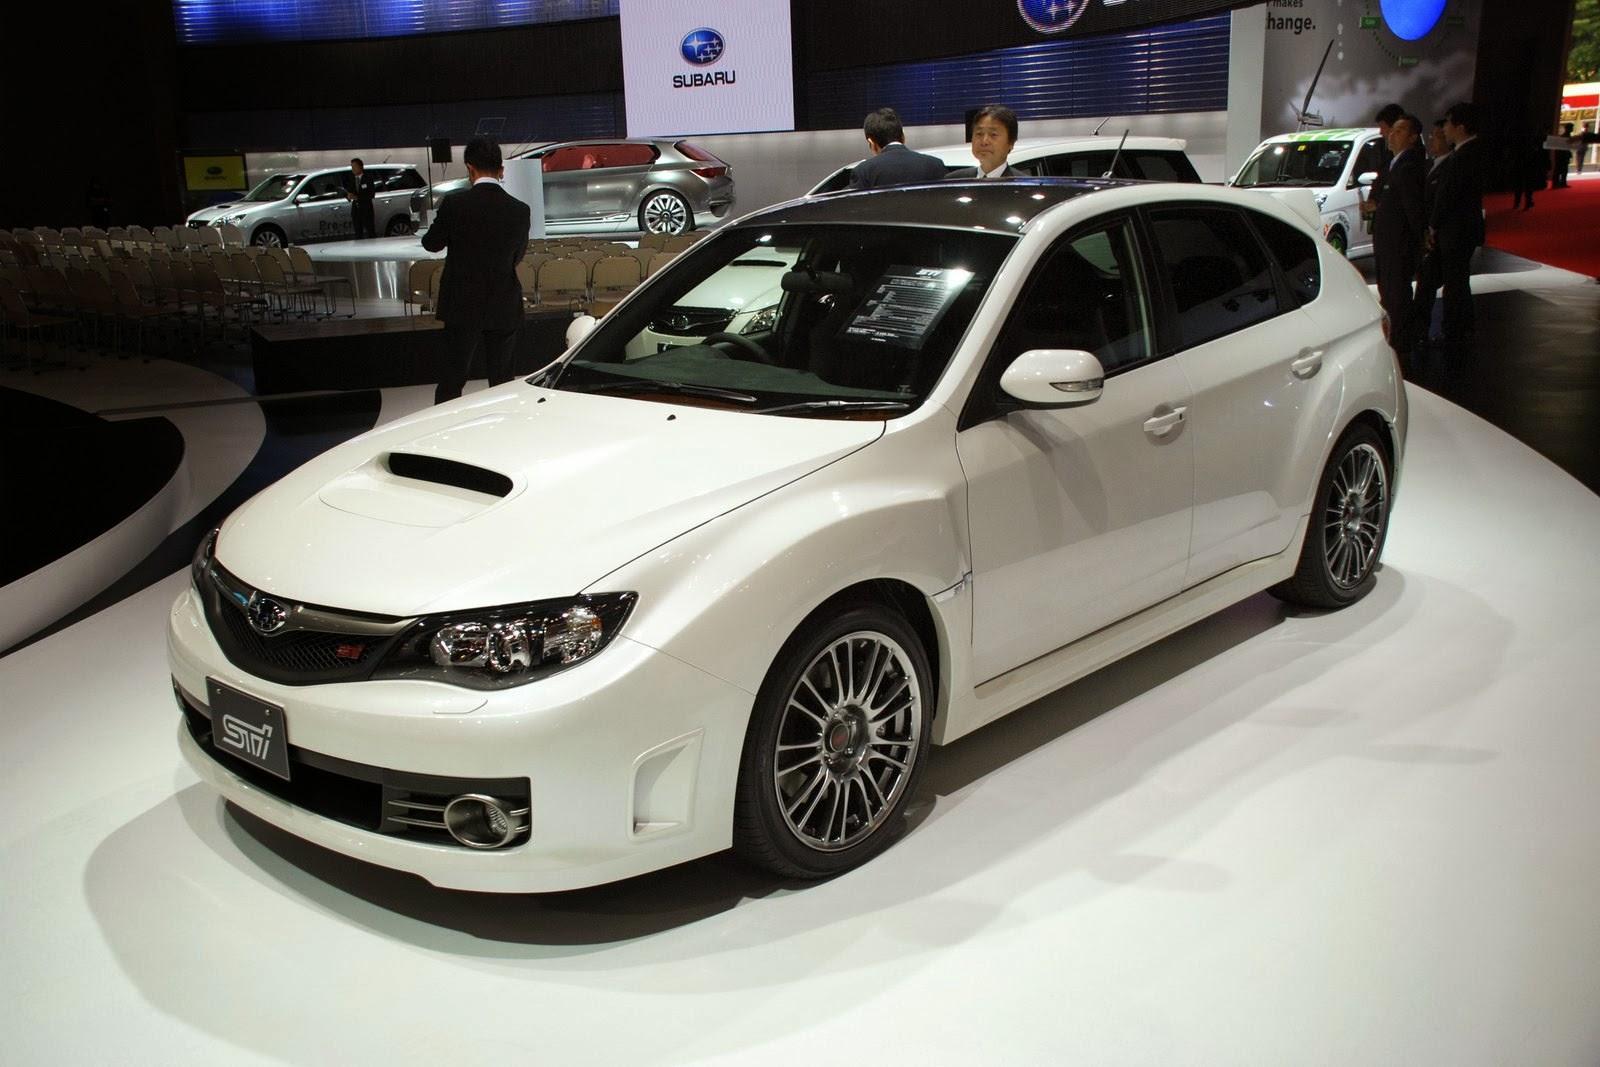 Free Download Subaru Impreza Wrx Sti Carbon 2014 Wallpaper